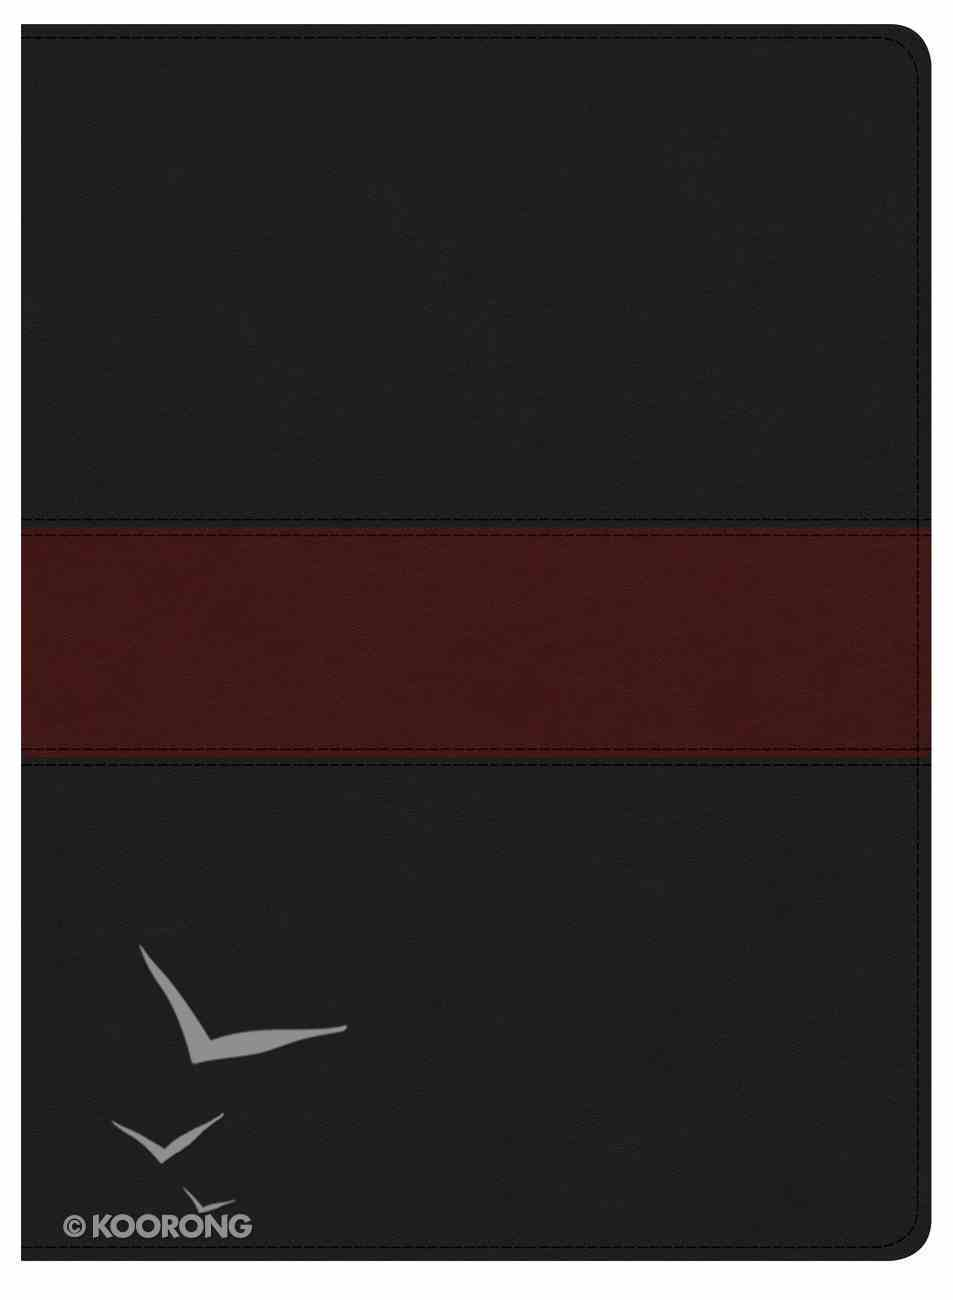 KJV Apologetics Study Bible Black/Red (Black Letter Edition) Imitation Leather